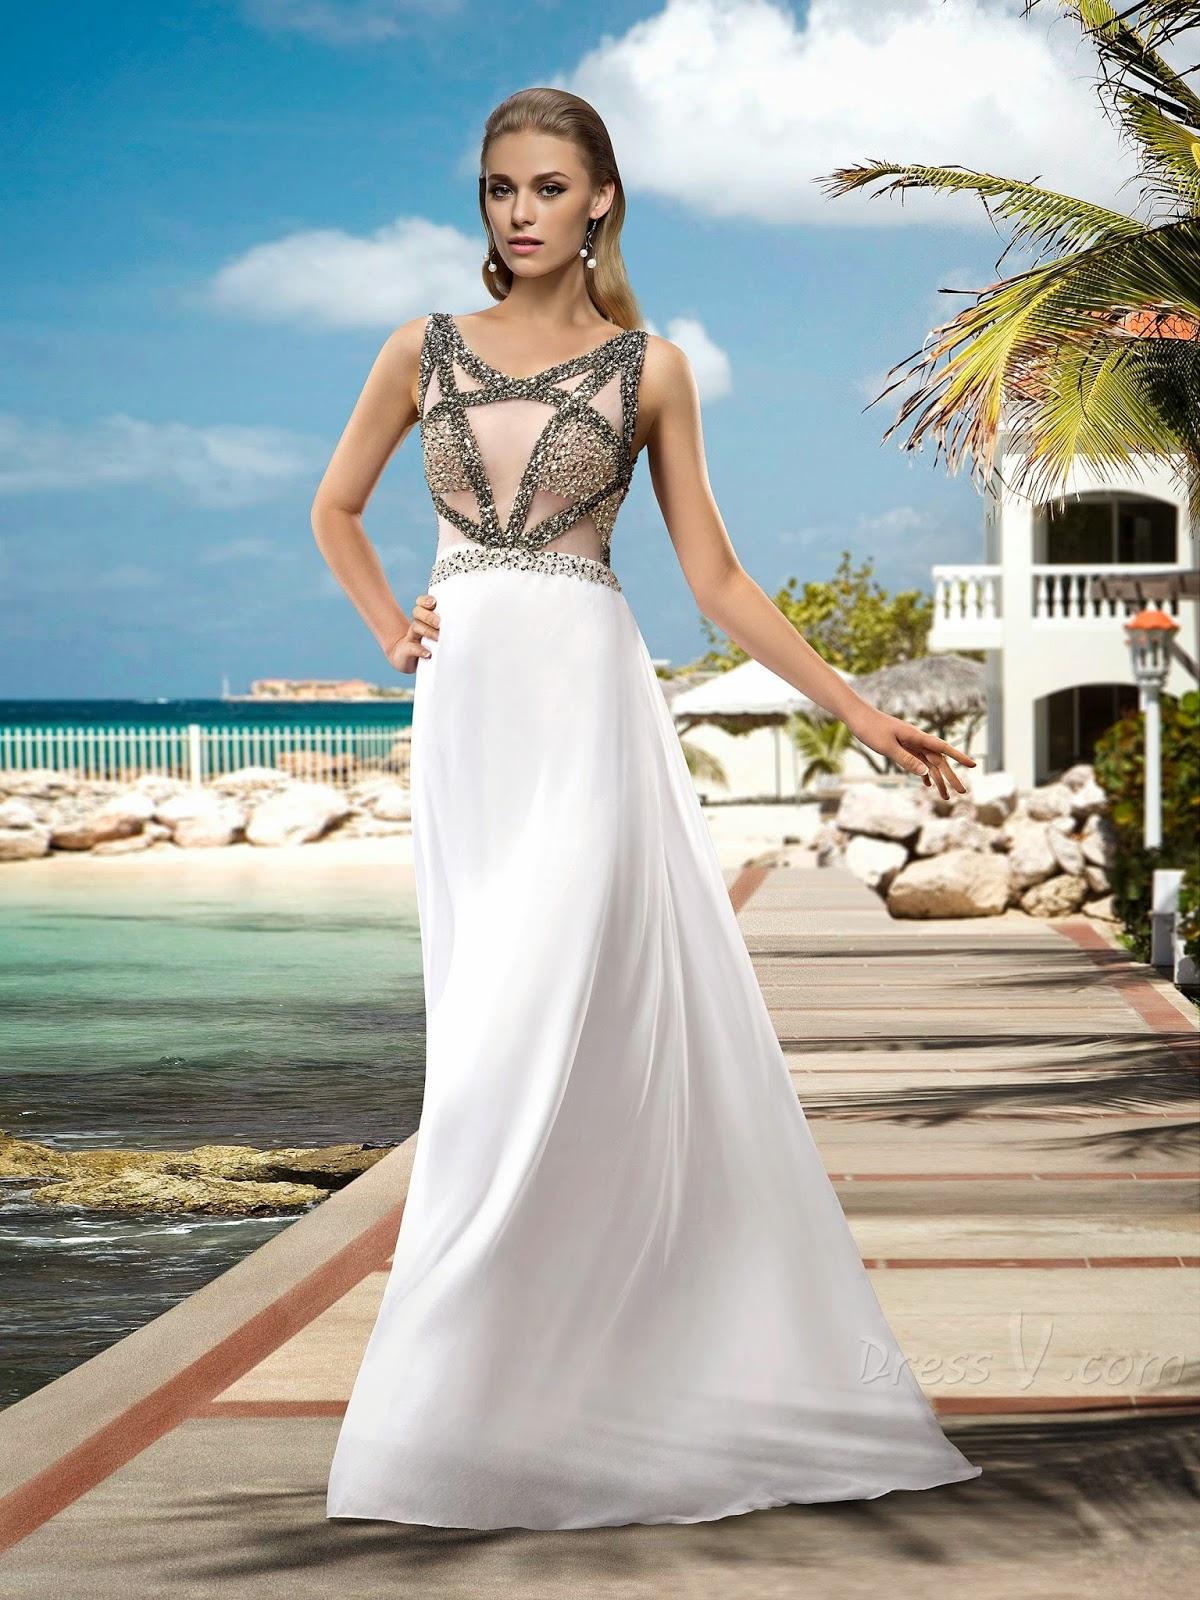 Simple Beach Wedding Dresses By Sana 39 S Ramblings On SheSaidBeauty